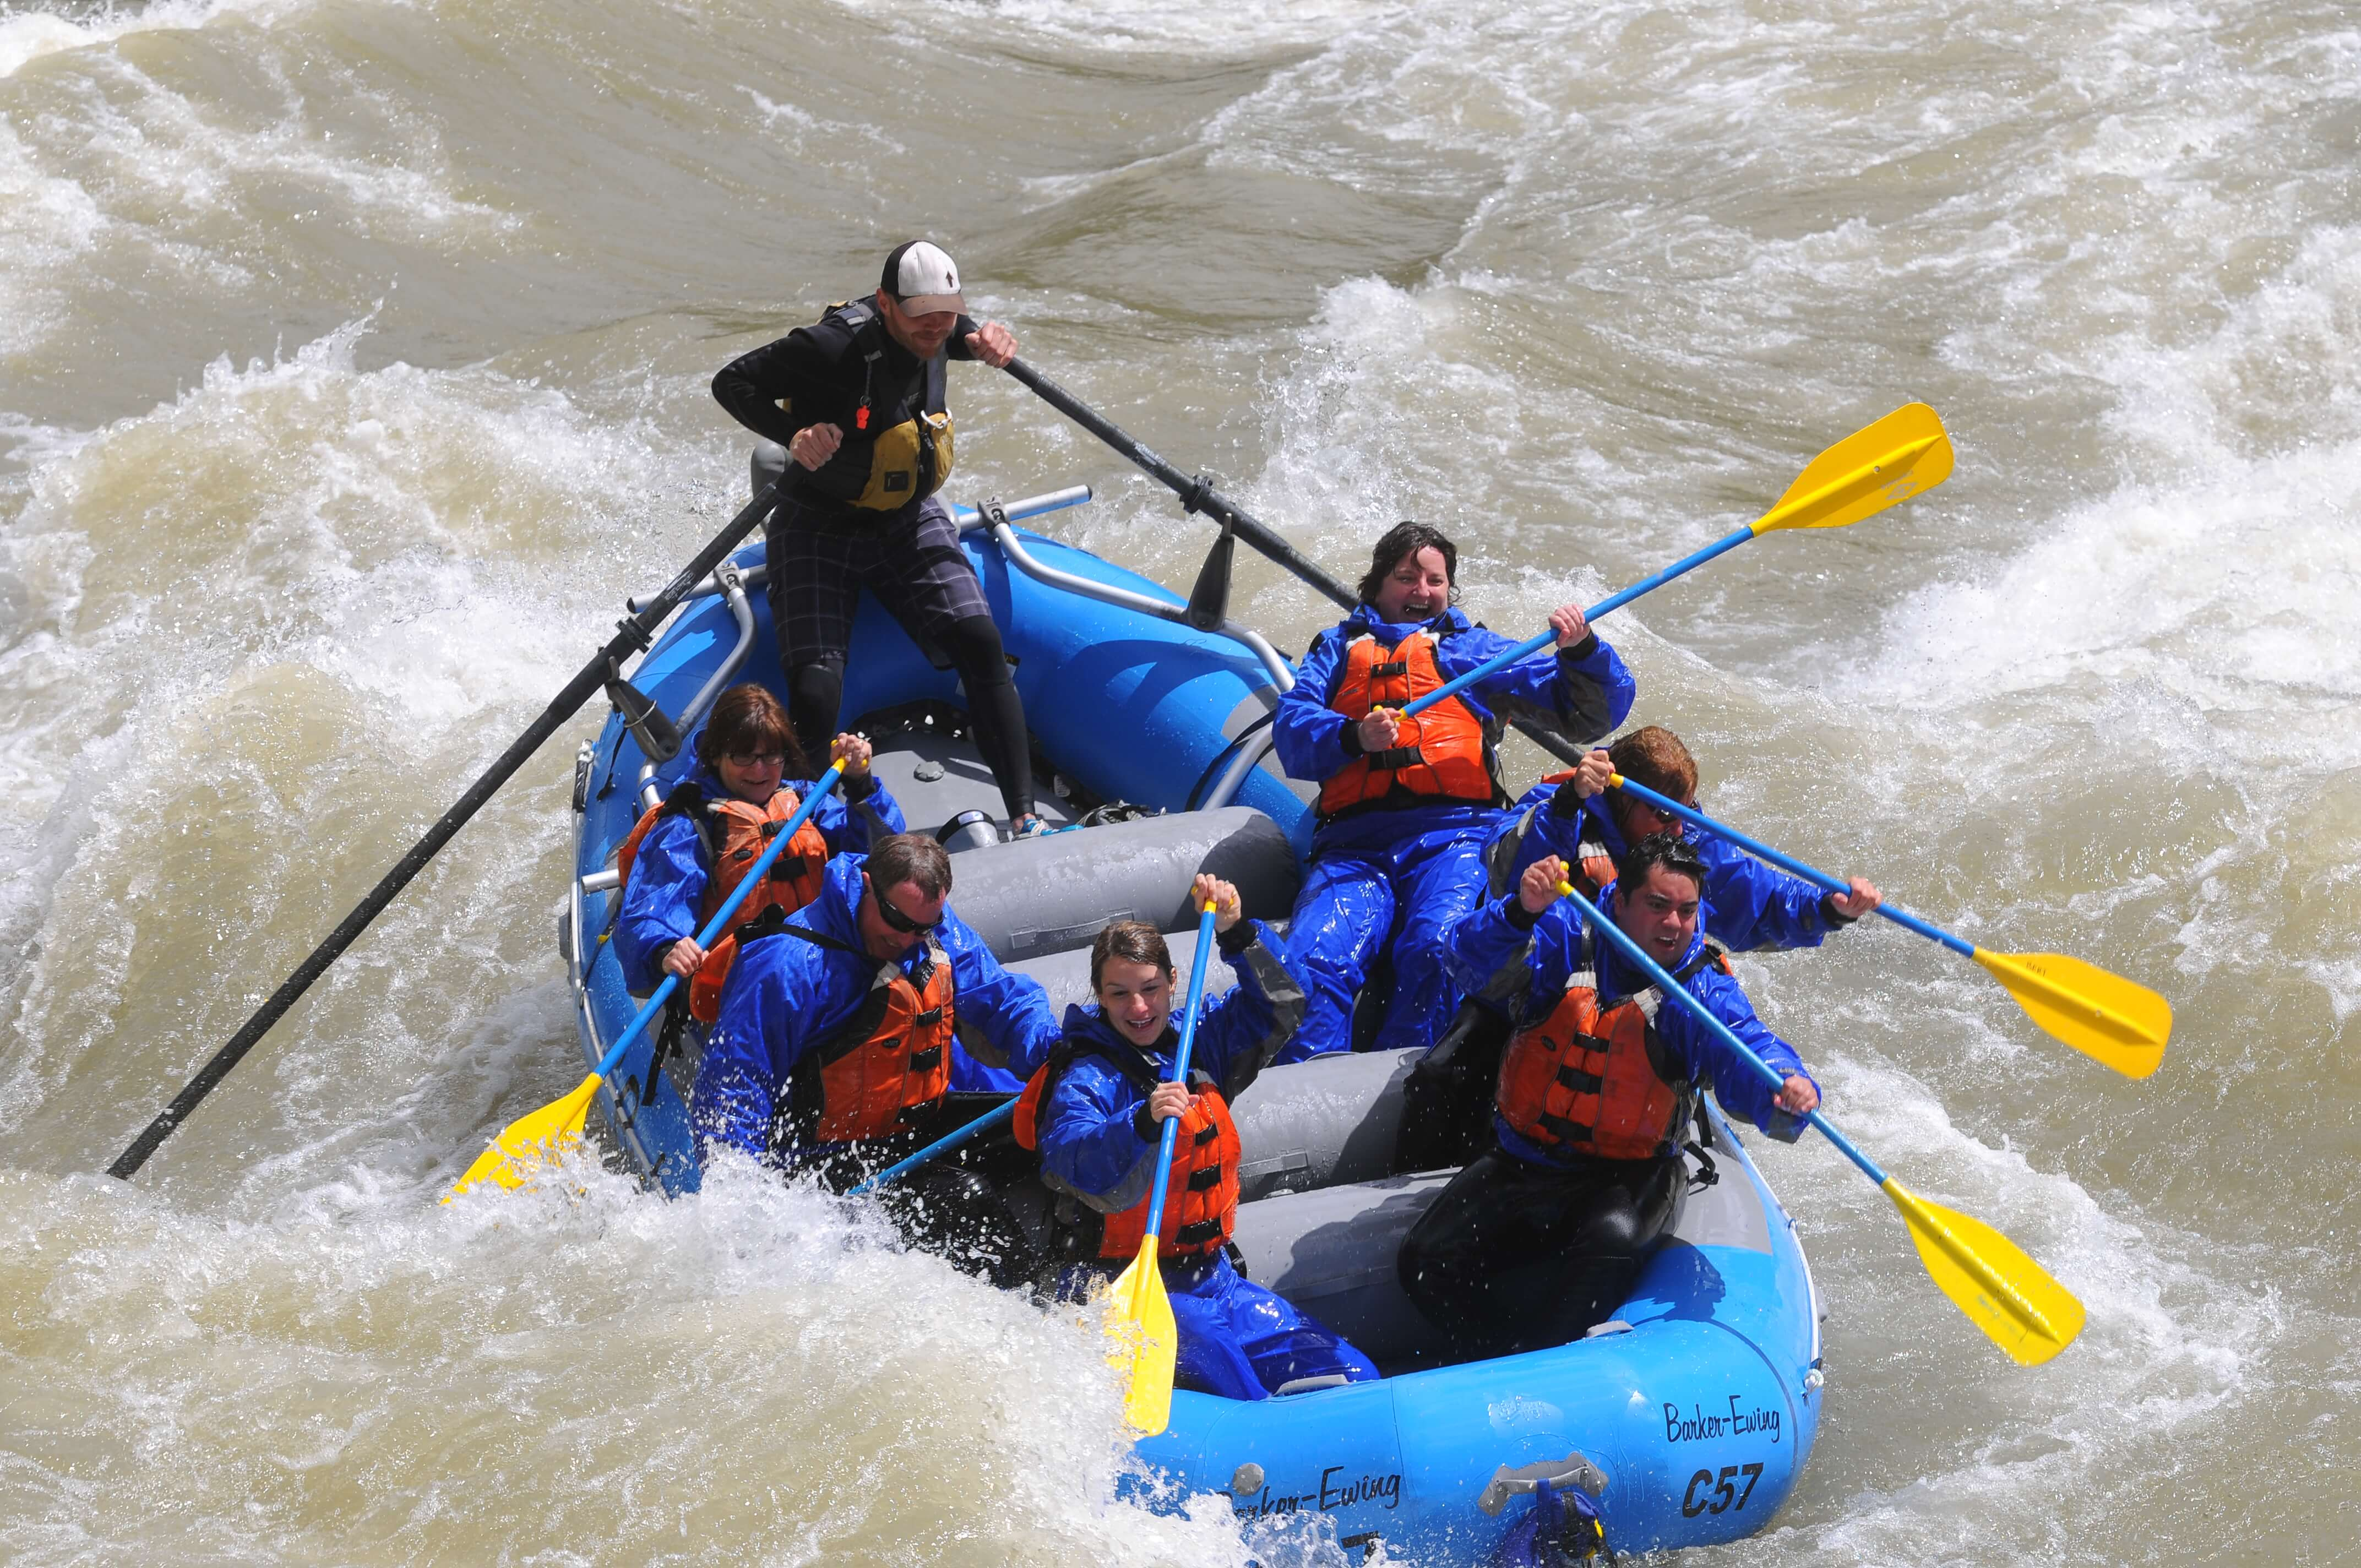 snake river rafting jackson hole